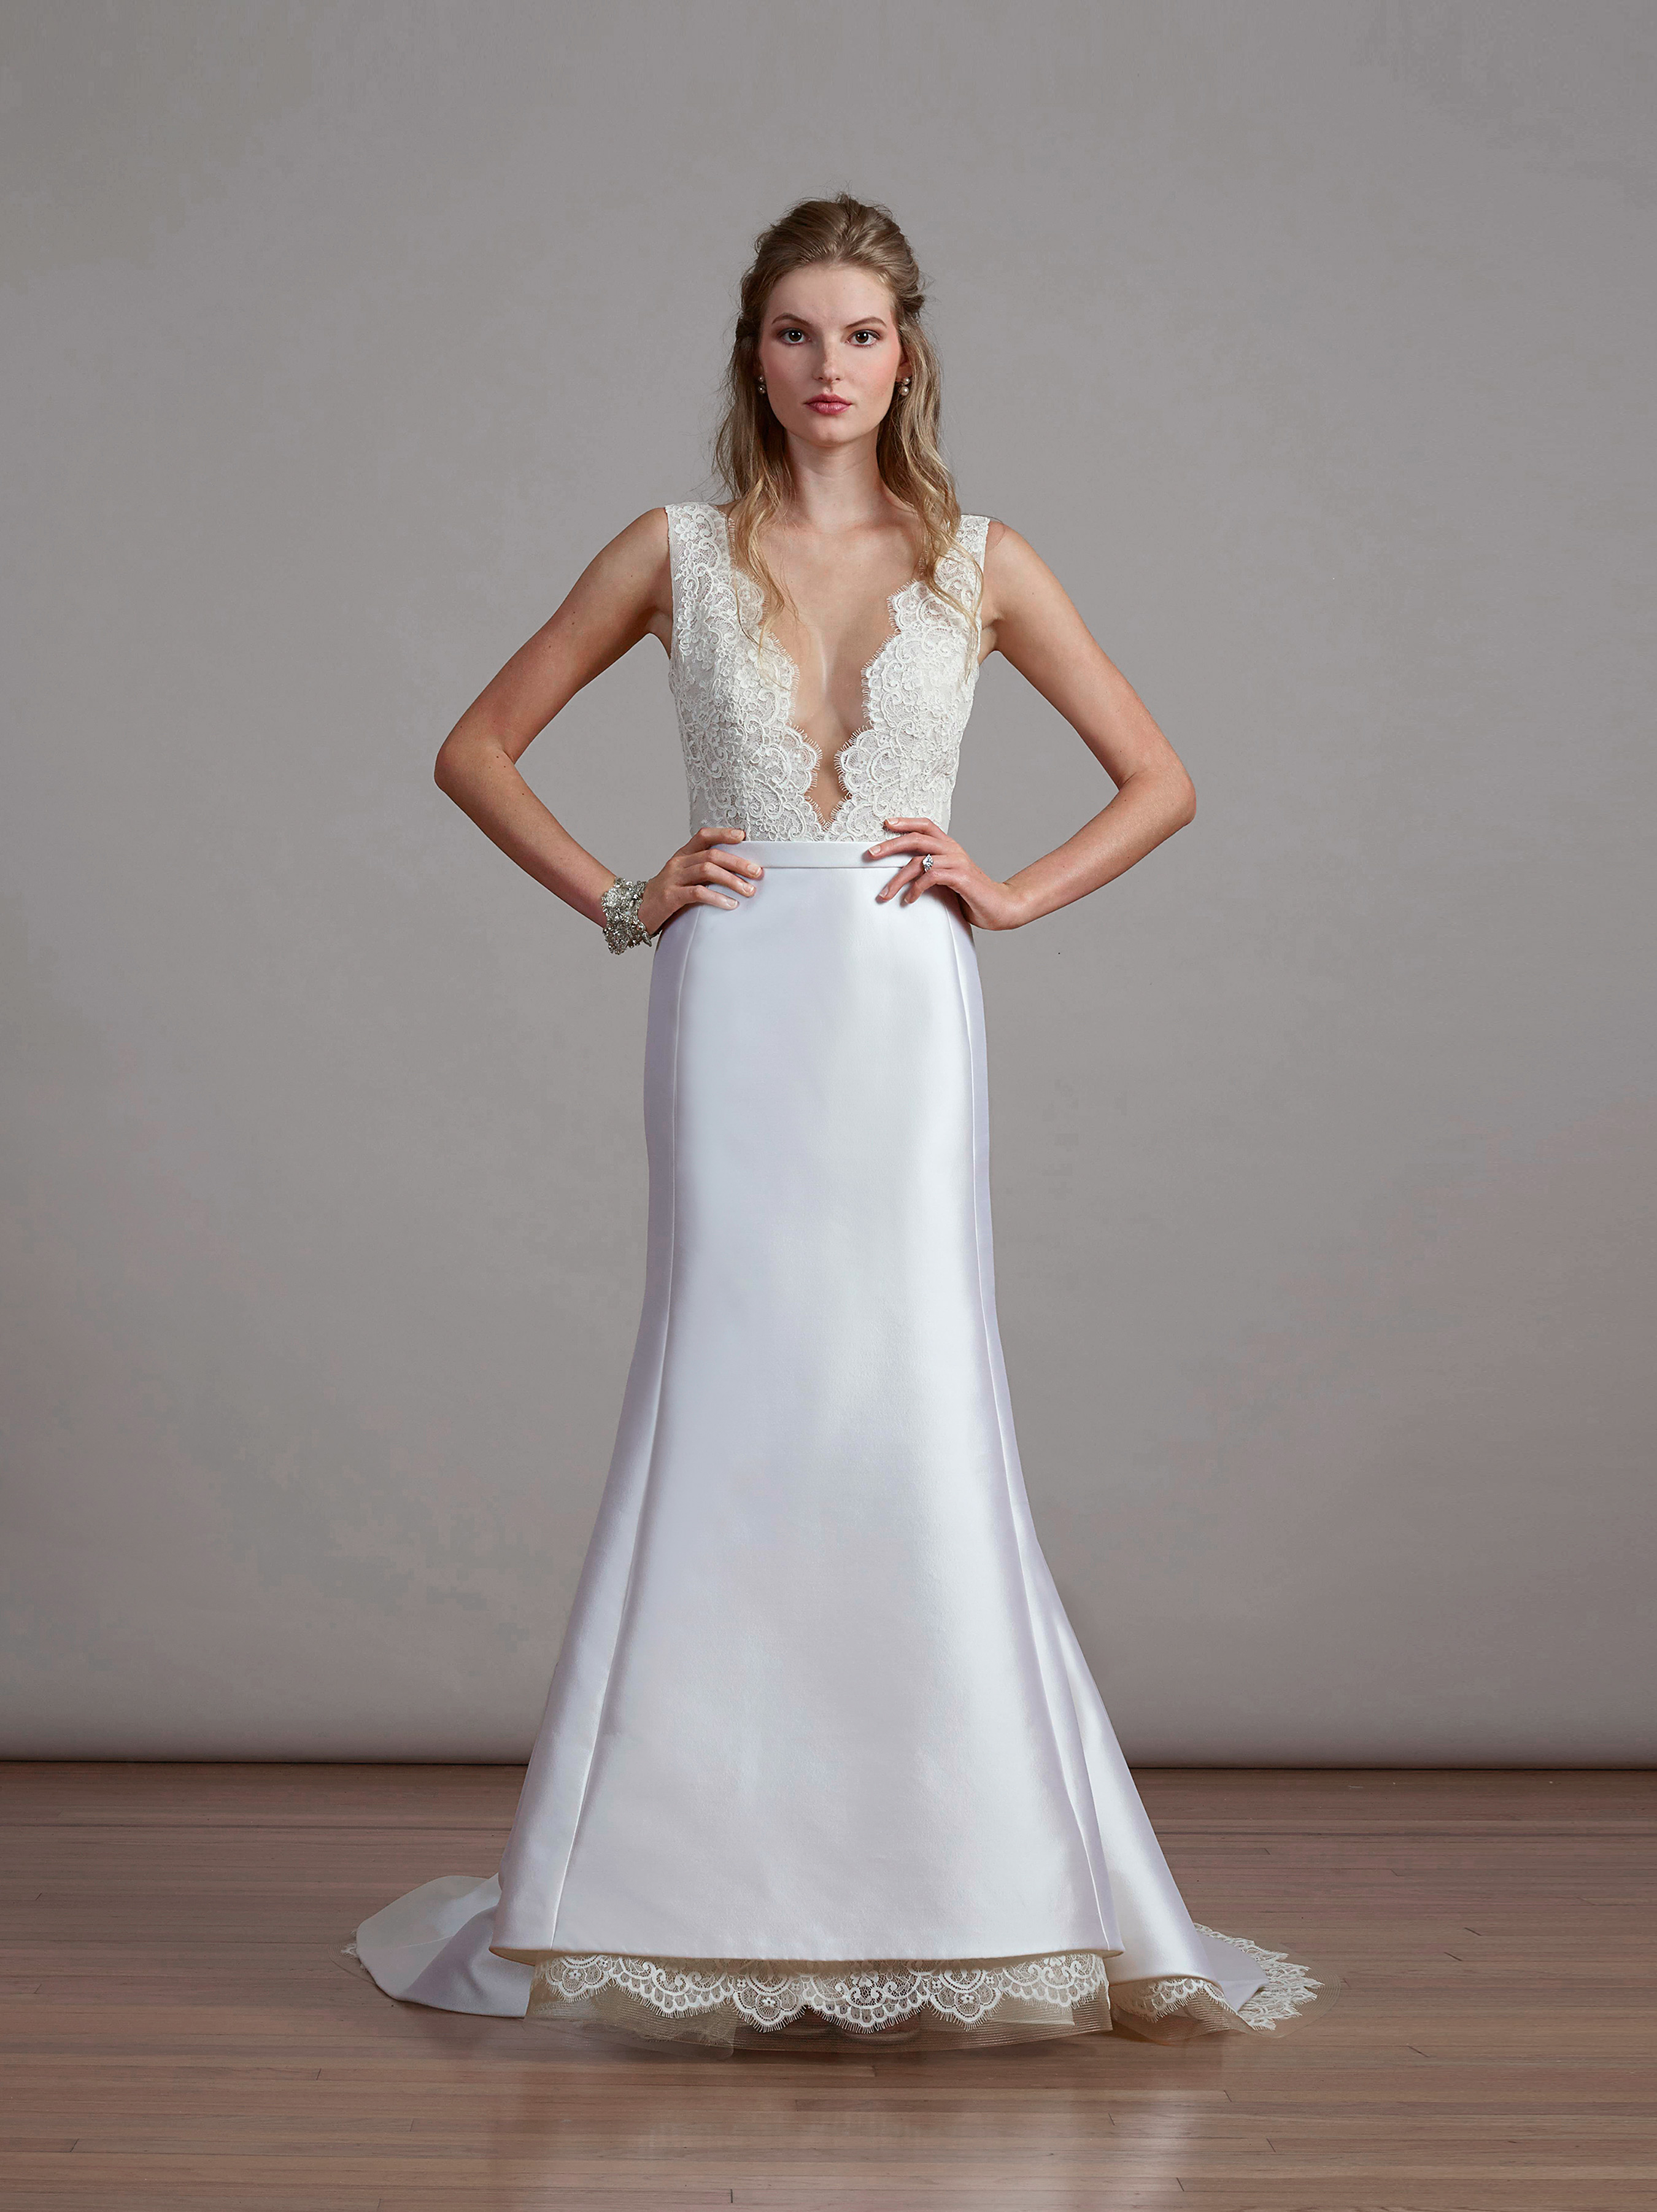 liancarlo v-neck lace wedding dress